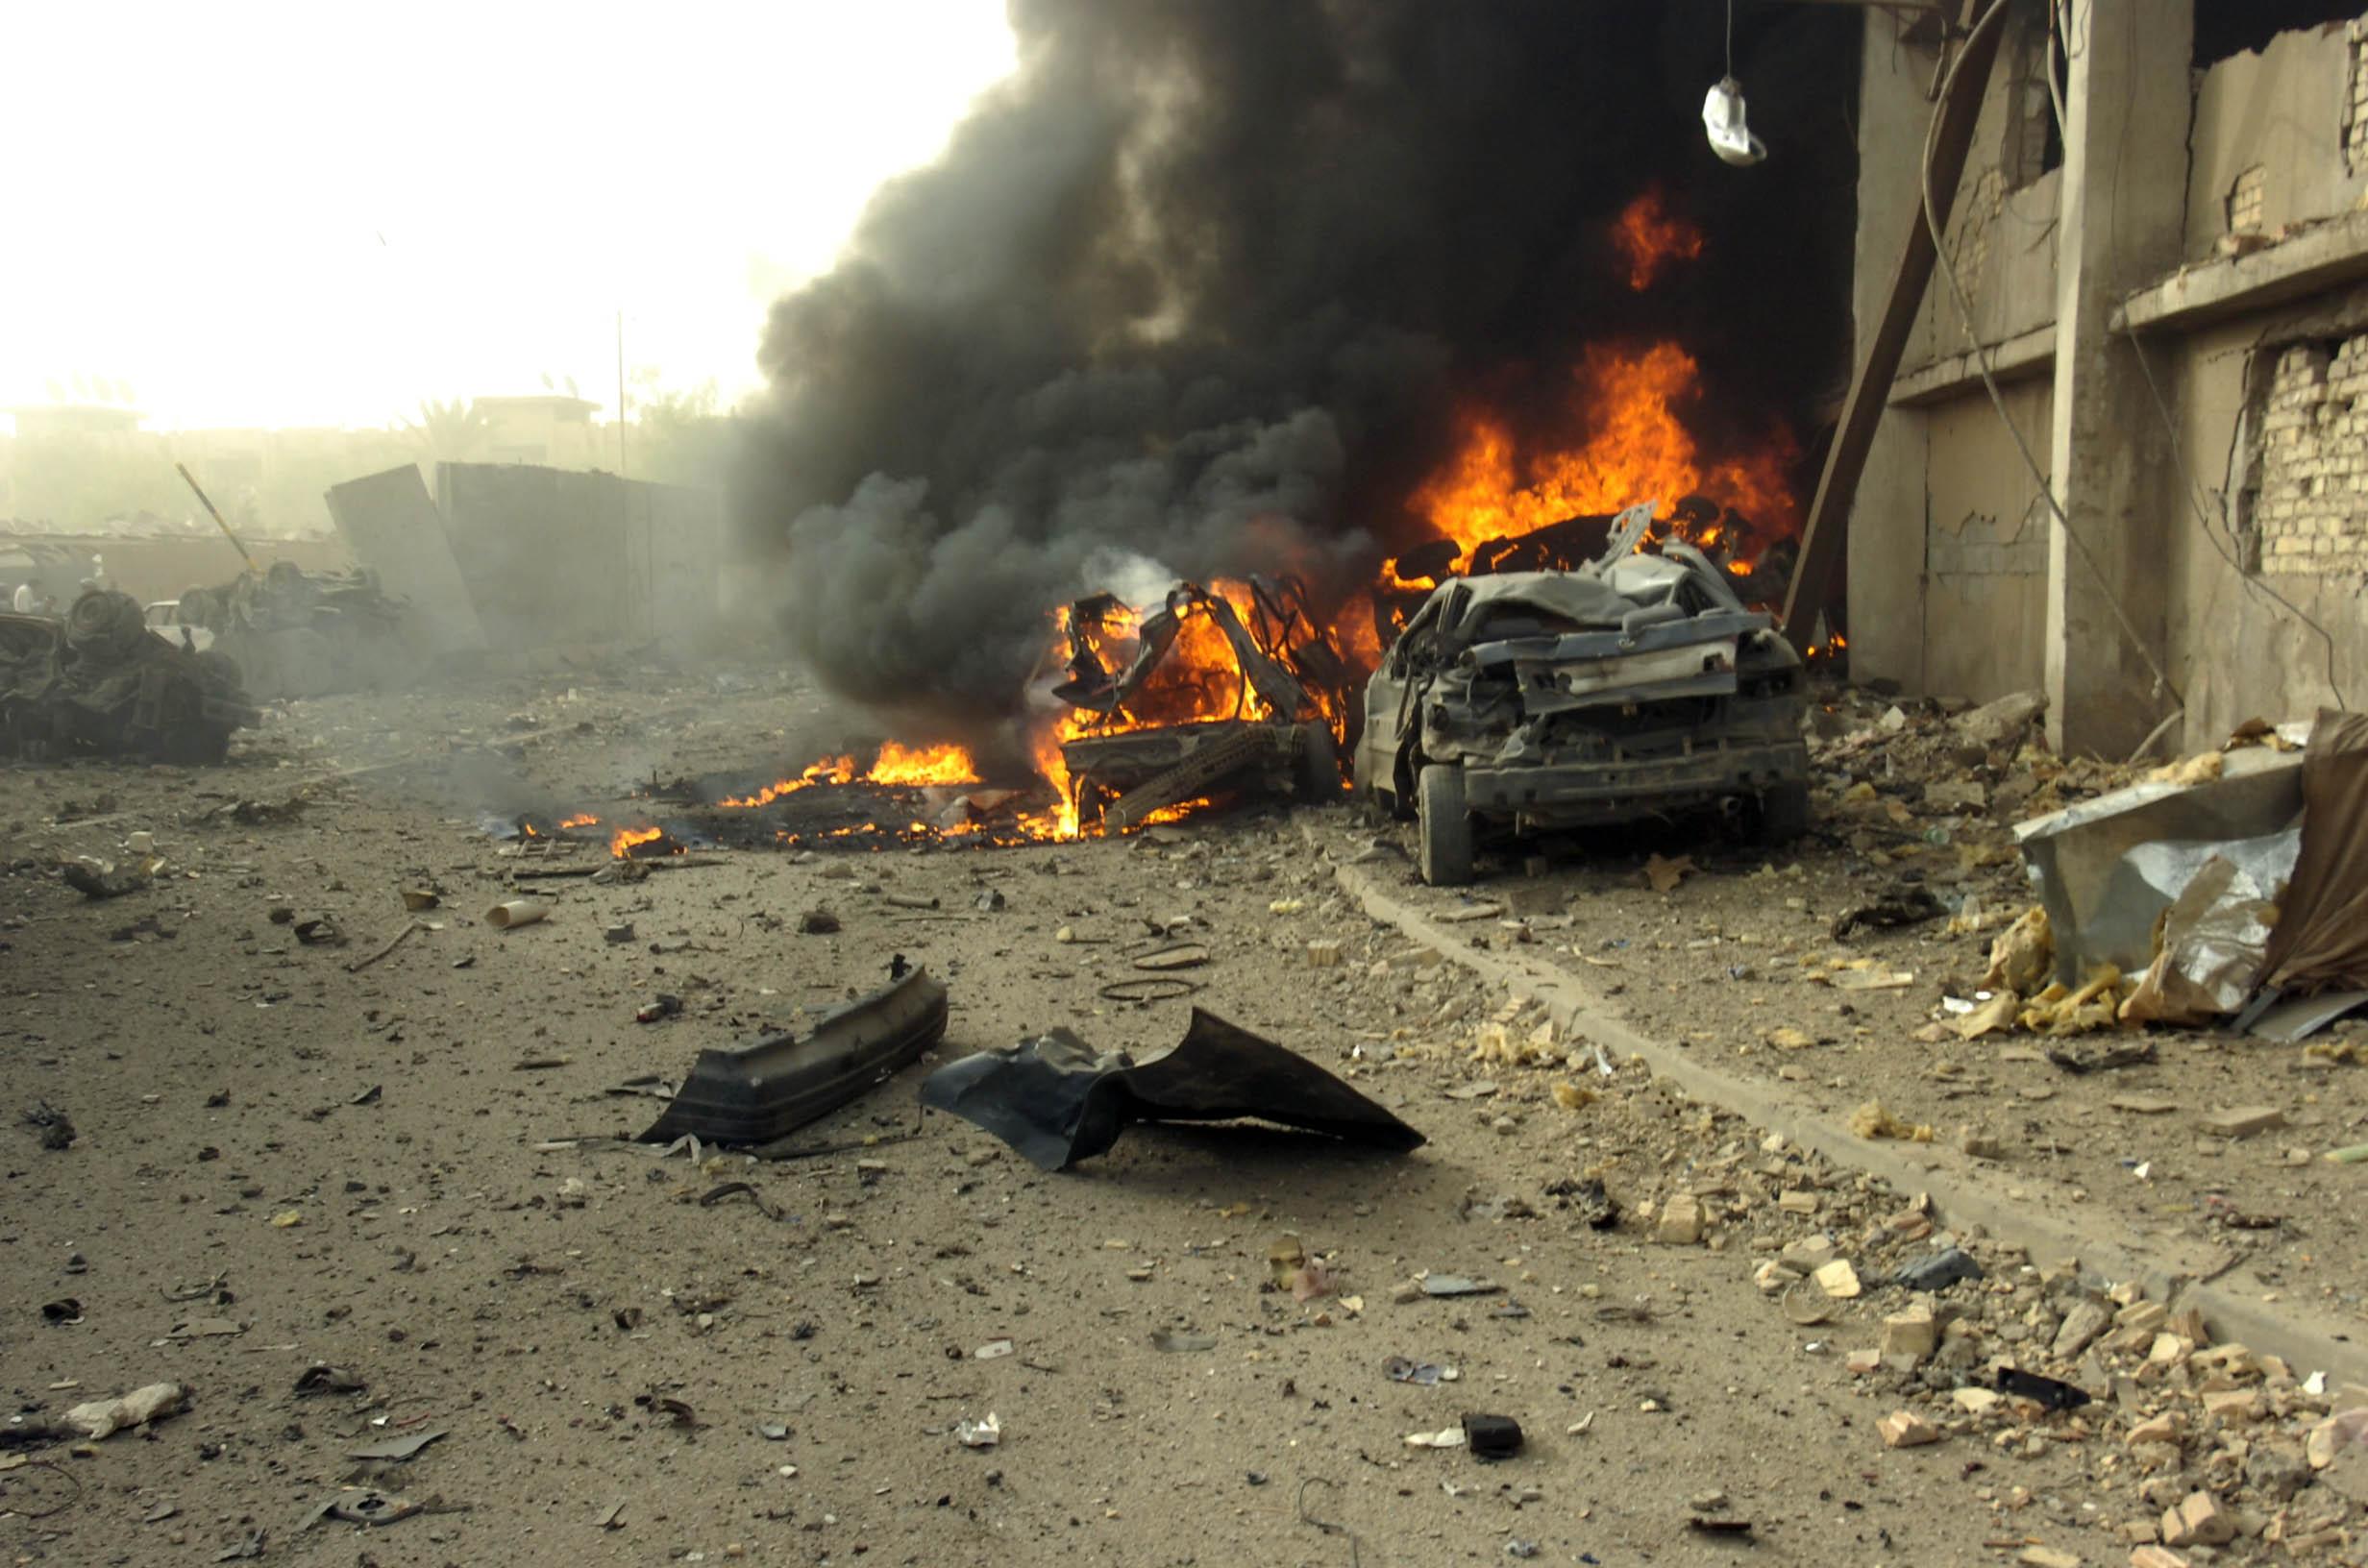 [1/35°] Guerre Occident-Iran, combat de rues quelque part en Iran - Page 2 WaziriyaAutobombeIrak